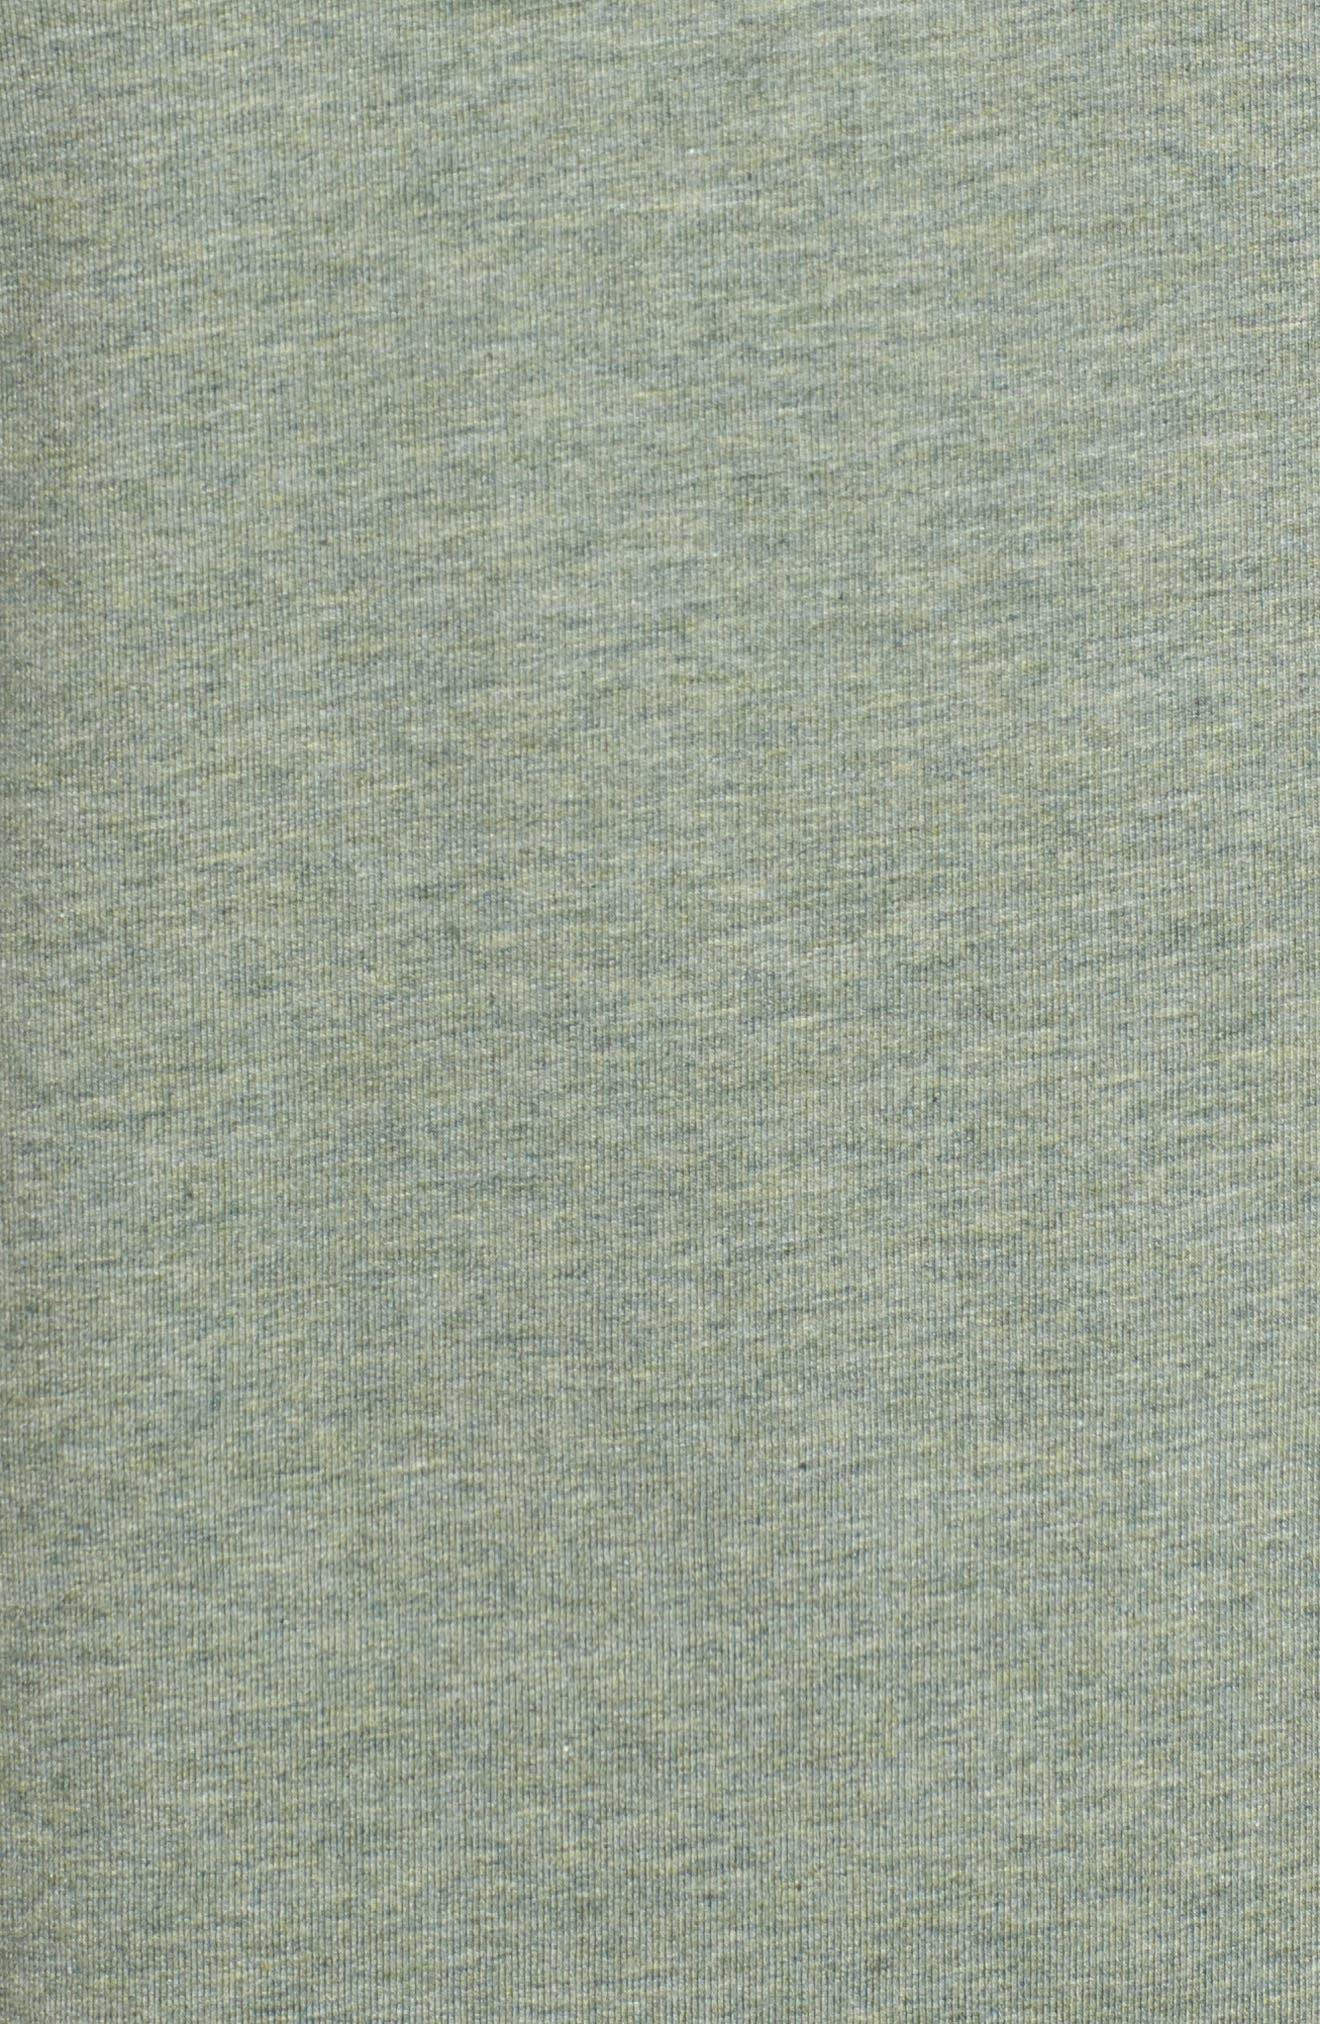 Legacy Crewneck Sweatshirt,                             Alternate thumbnail 5, color,                             Kelp Heather